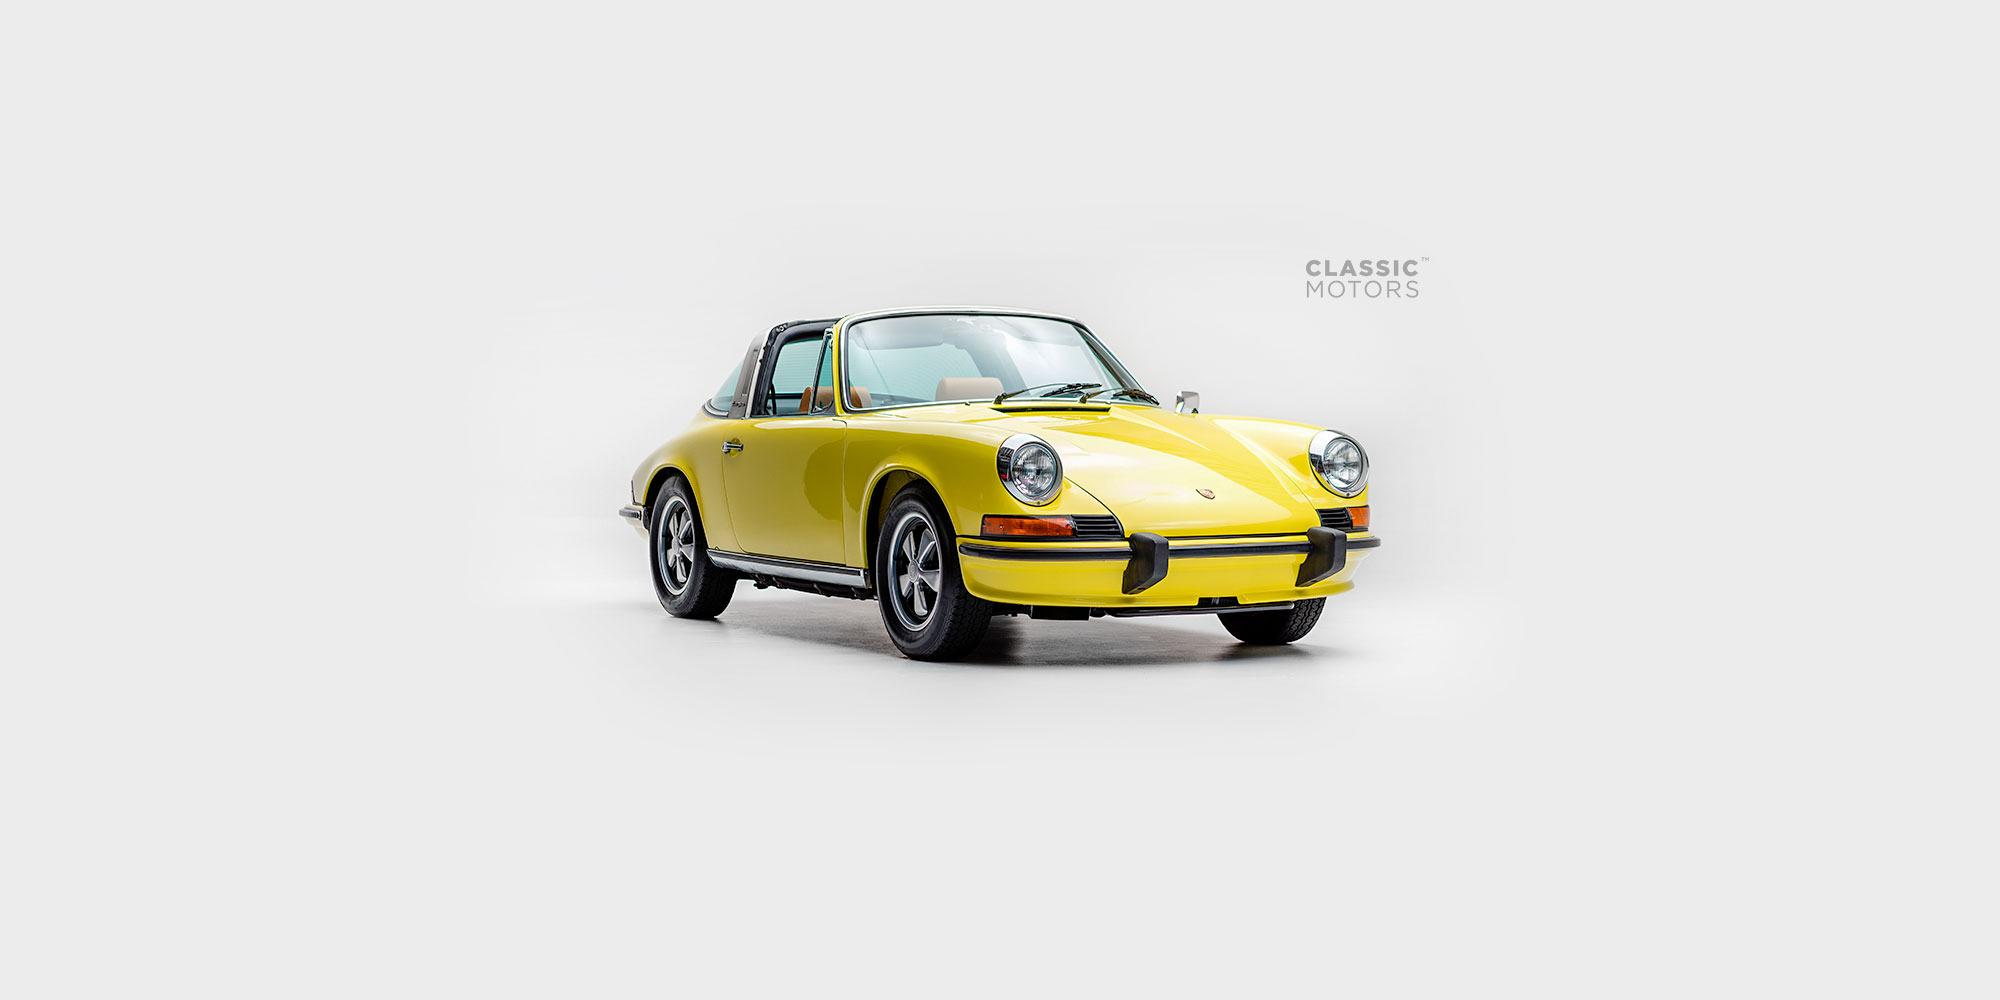 1973 Porsche 911e Targa Yellow Juan Rivas 912 Coupe Type Of Engine Automotive Photography Videography And 3d Modeling